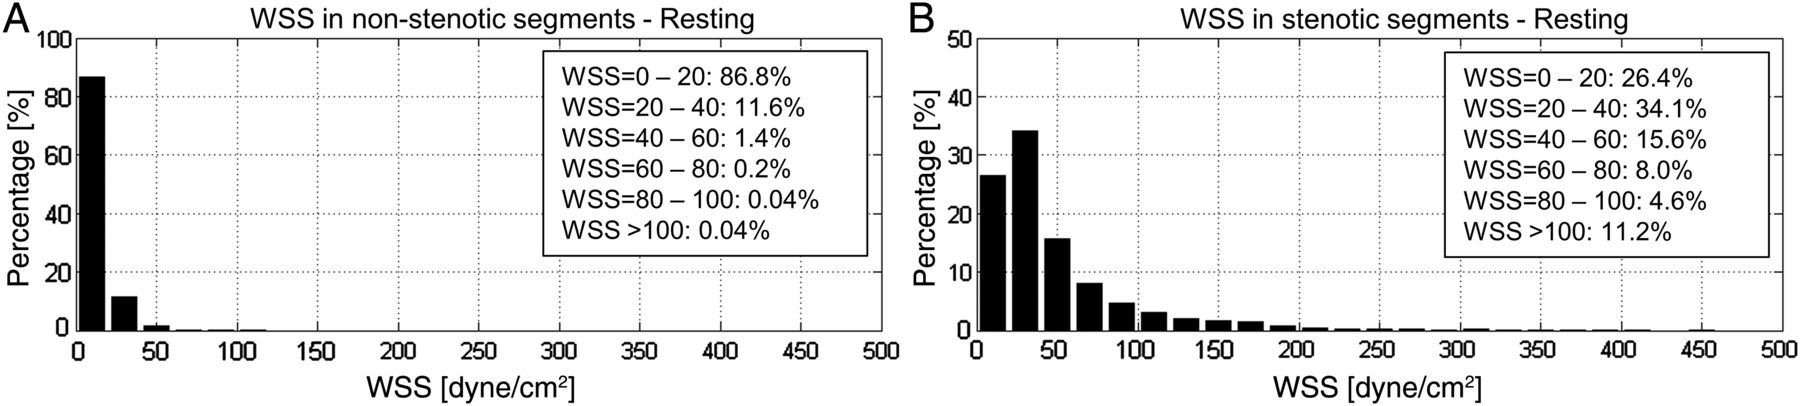 Computational fluid dynamic measures of wall shear stress are